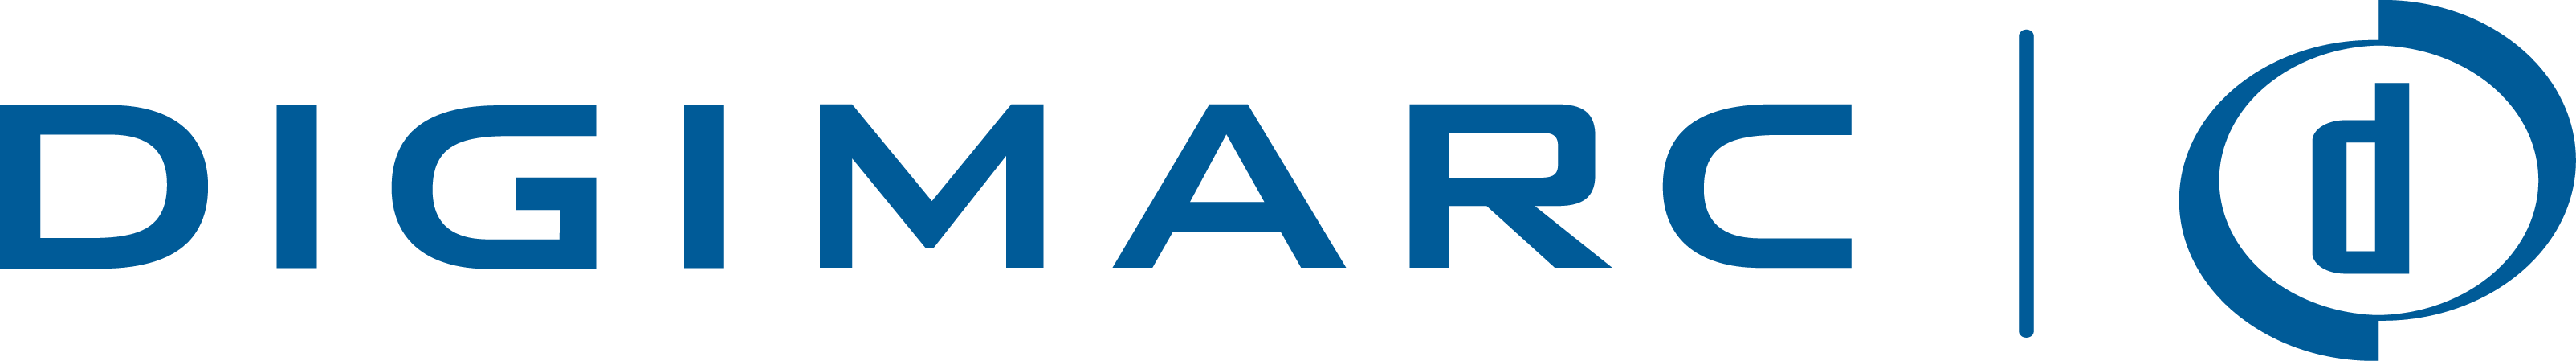 https://europeanplasticspact.org/wp-content/uploads/2020/03/Digimarc-Corporation.png